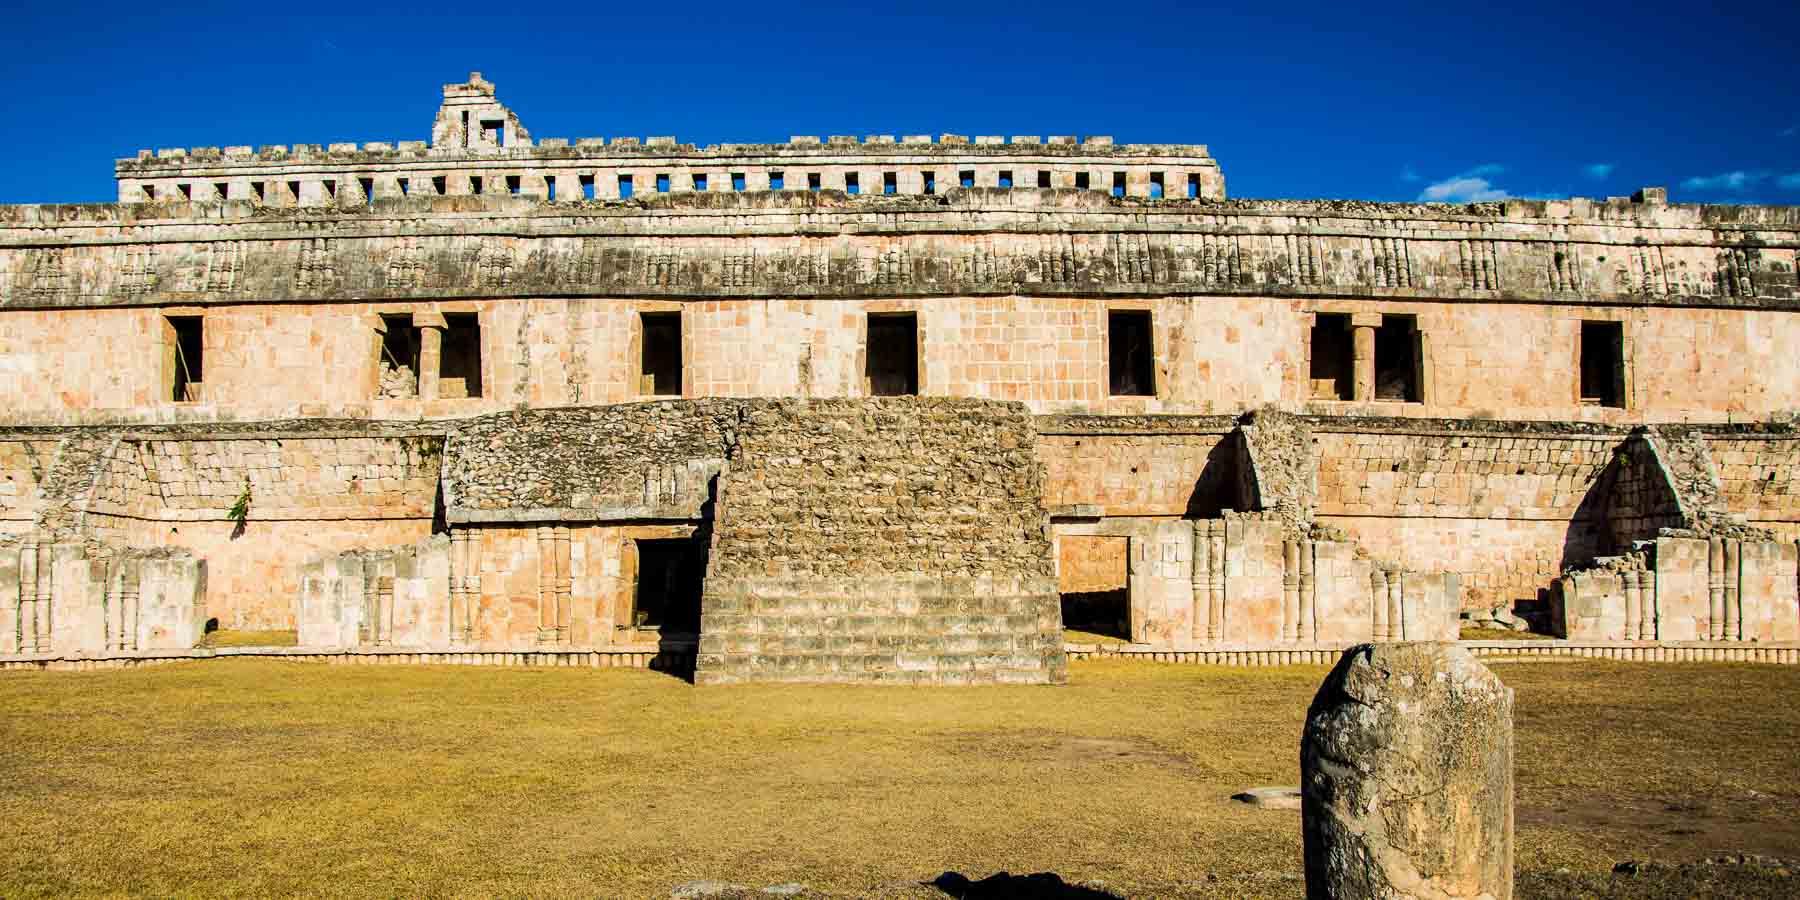 Ruling class quarters at the Mayan ruin of Kabah.